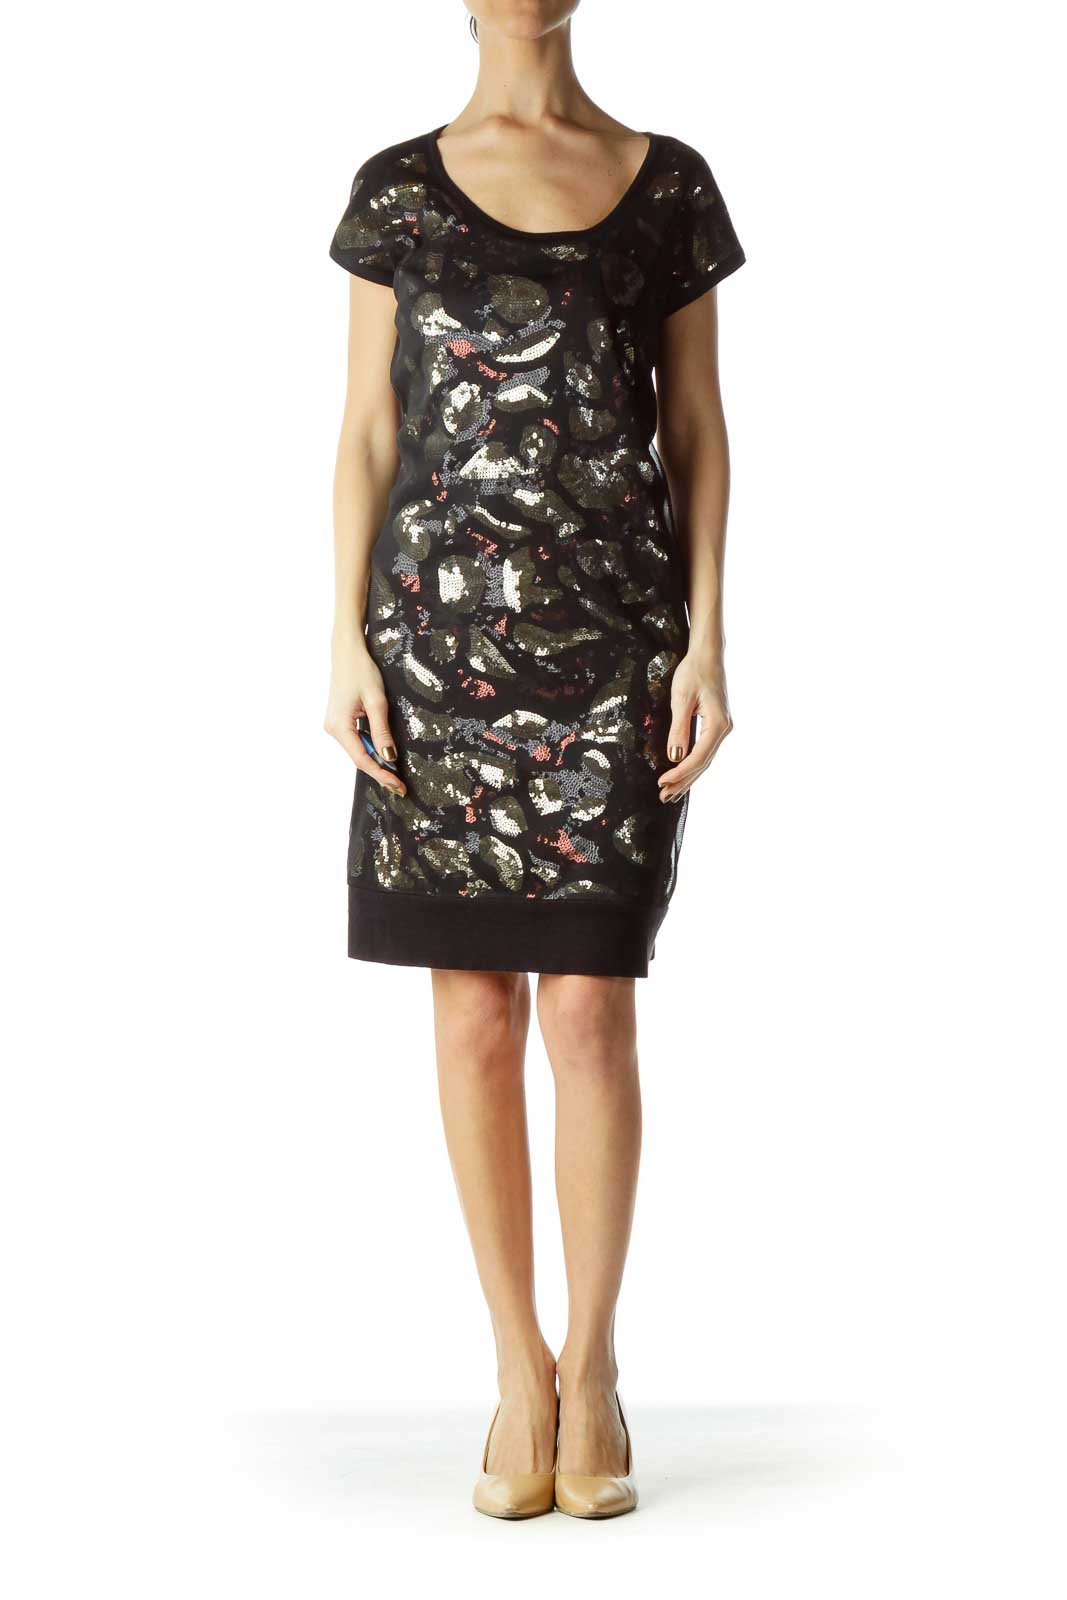 Black Brown Sequined Sheer Dress